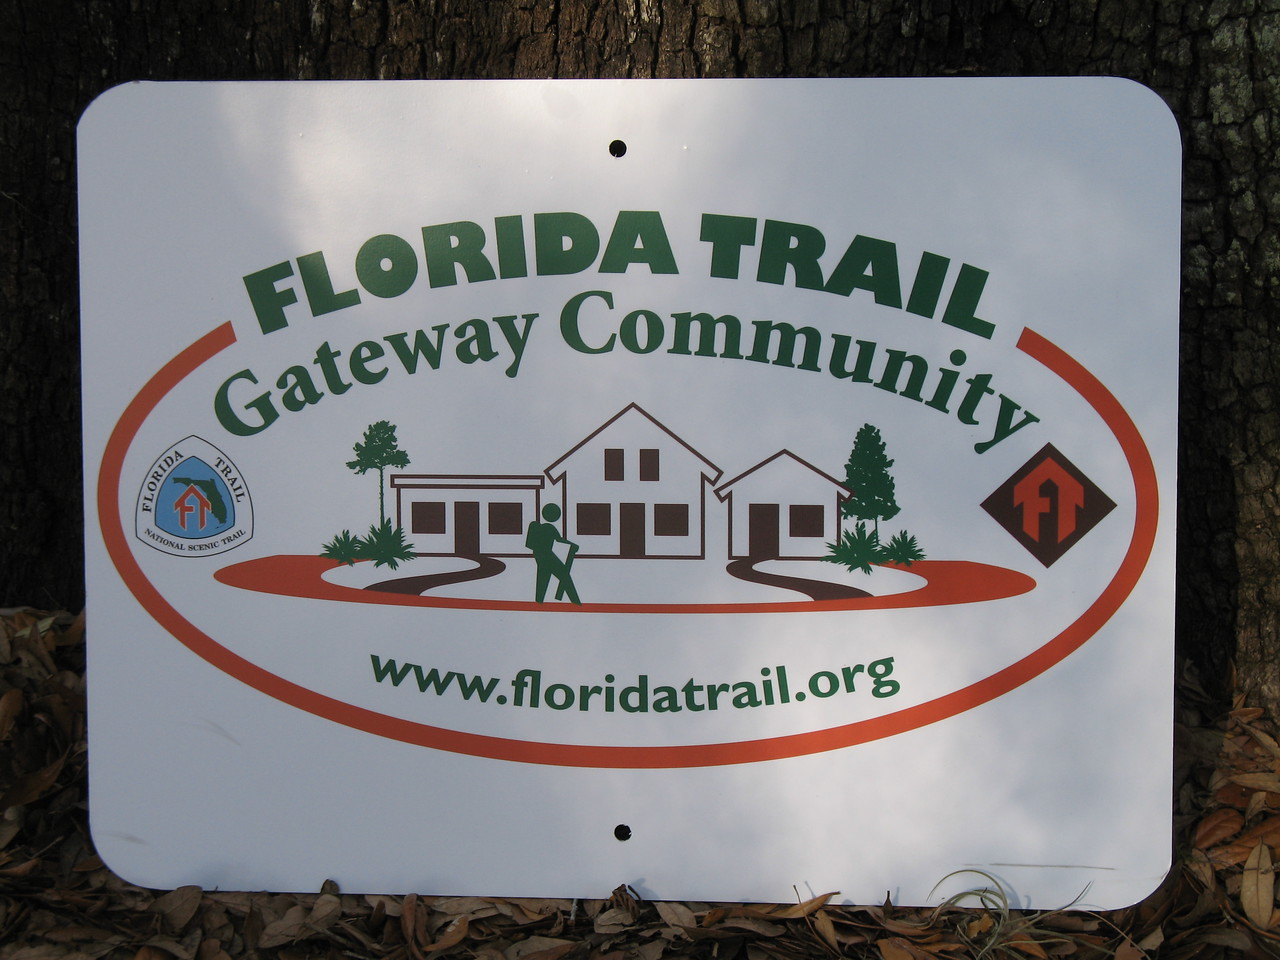 Florida Trail Gateway Community road sign